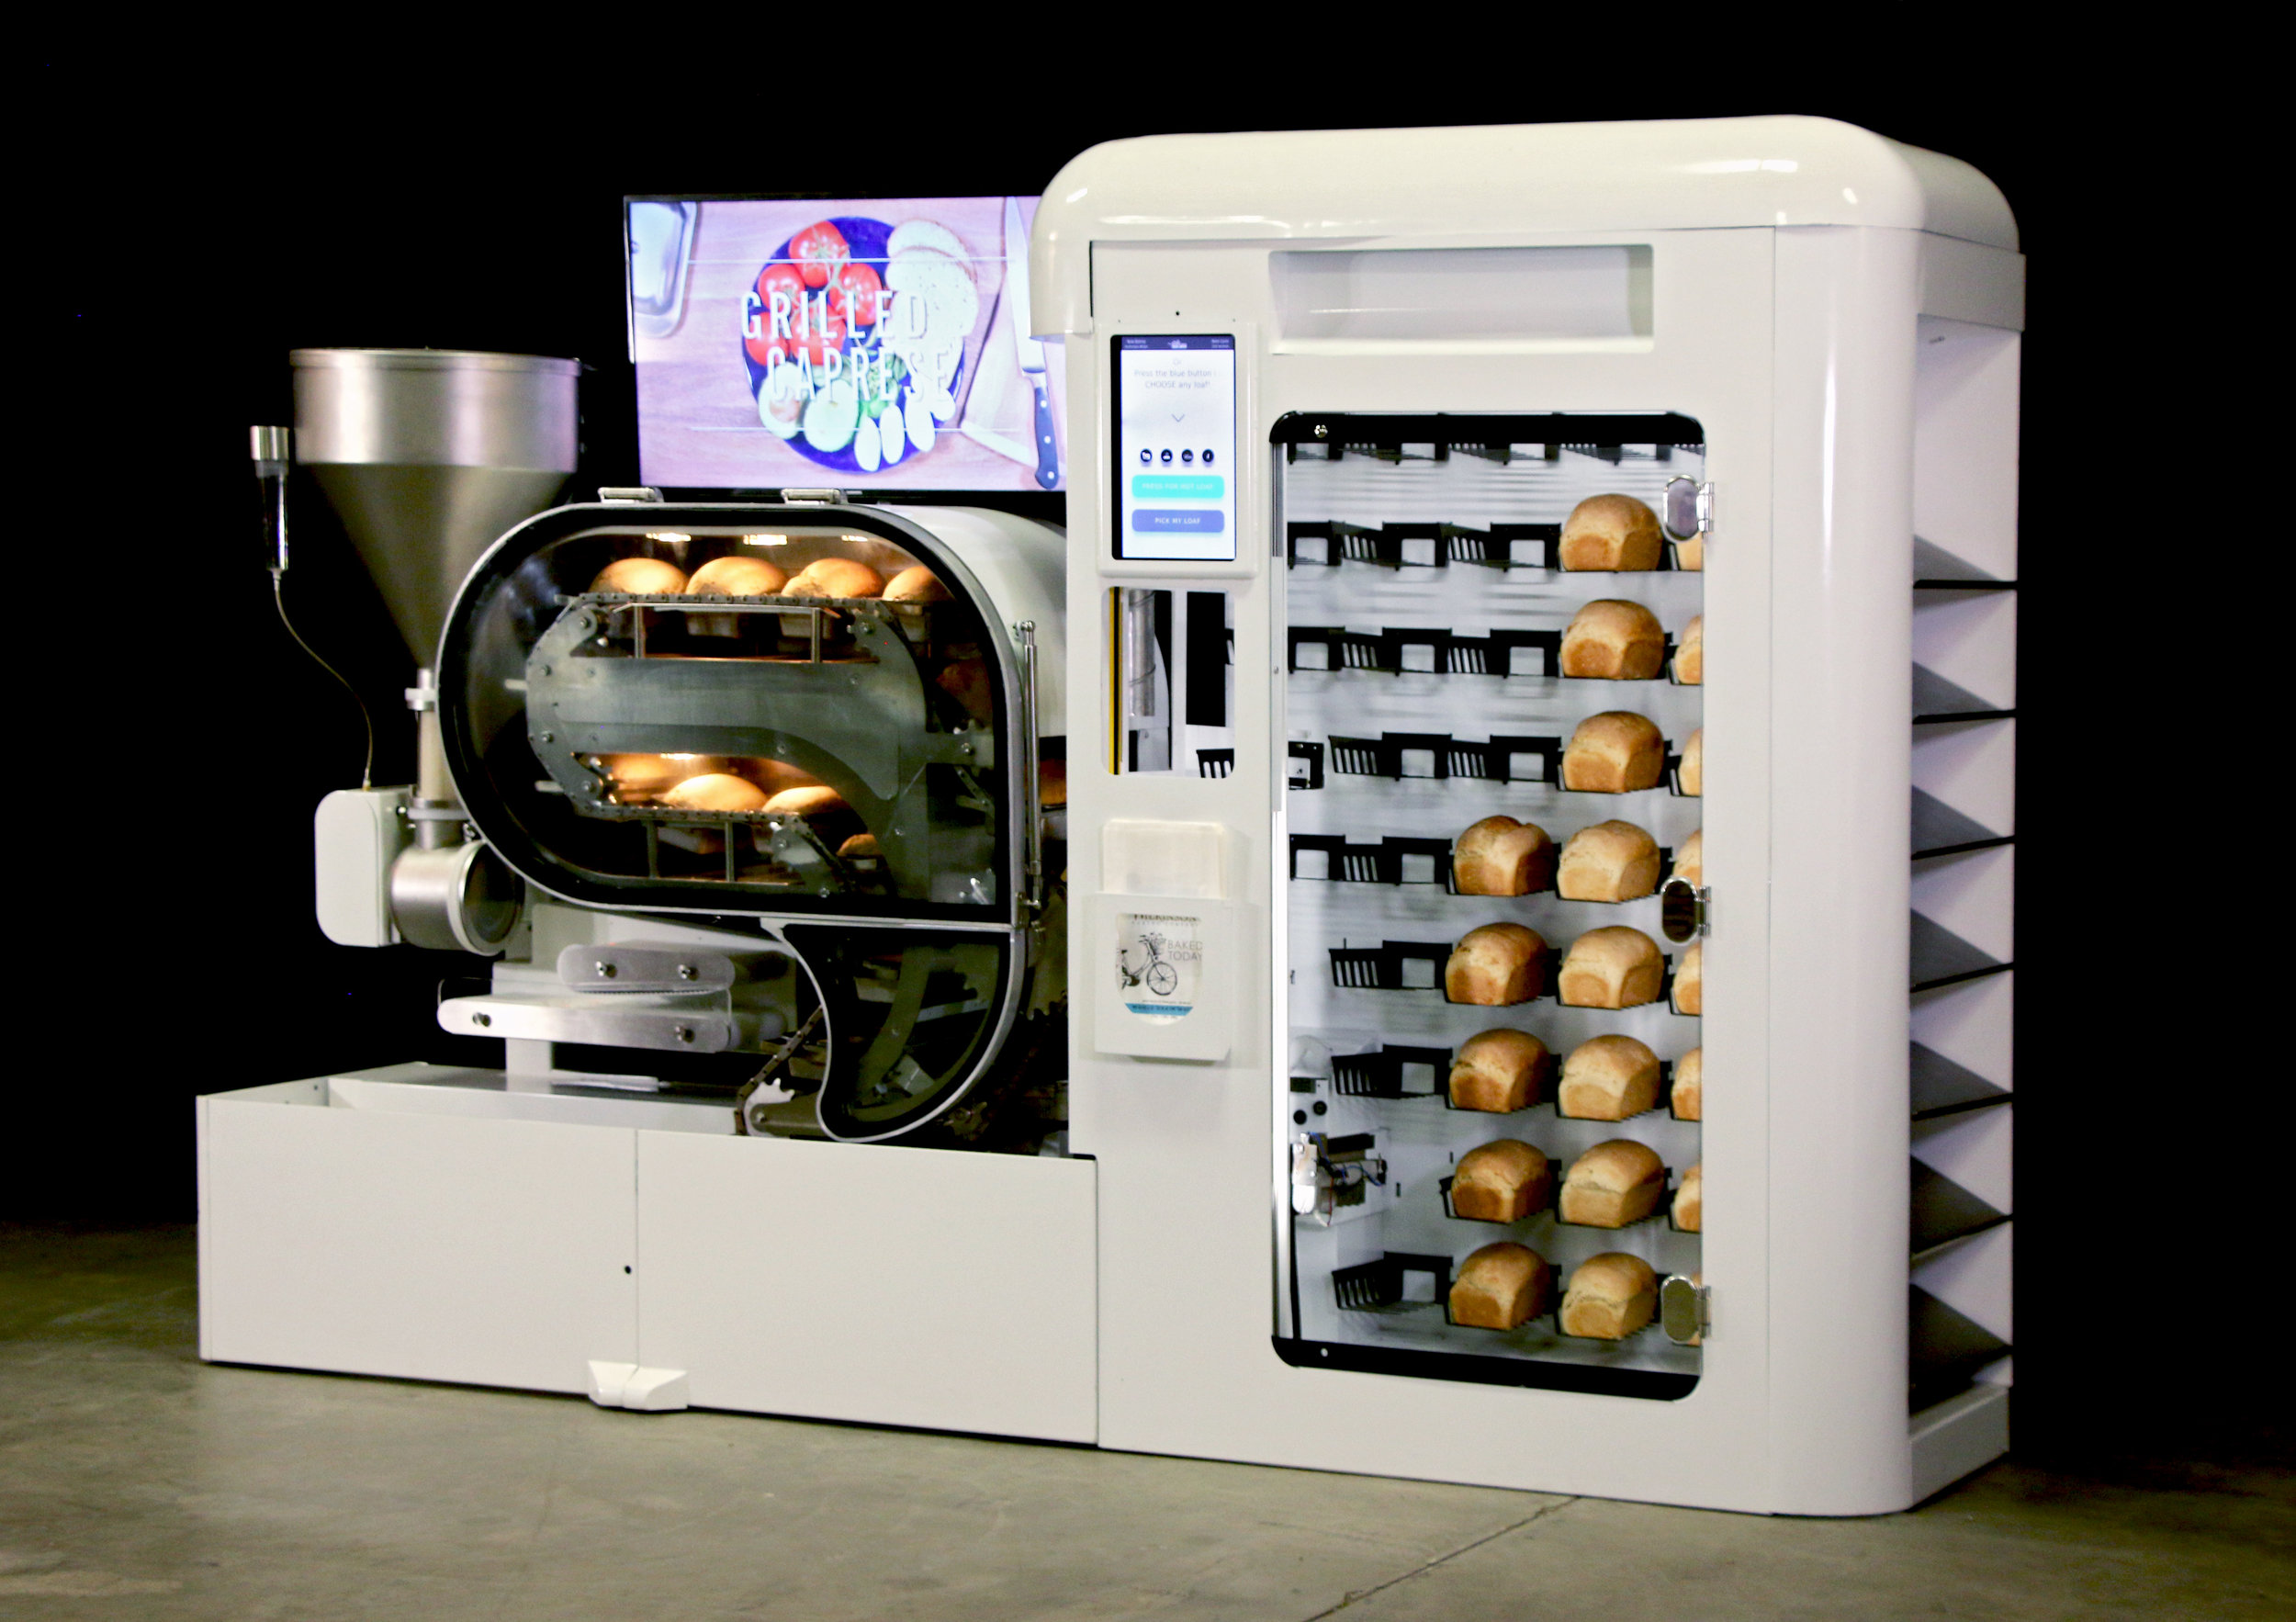 Wilkinson Baking Company Press Photo 3.jpeg